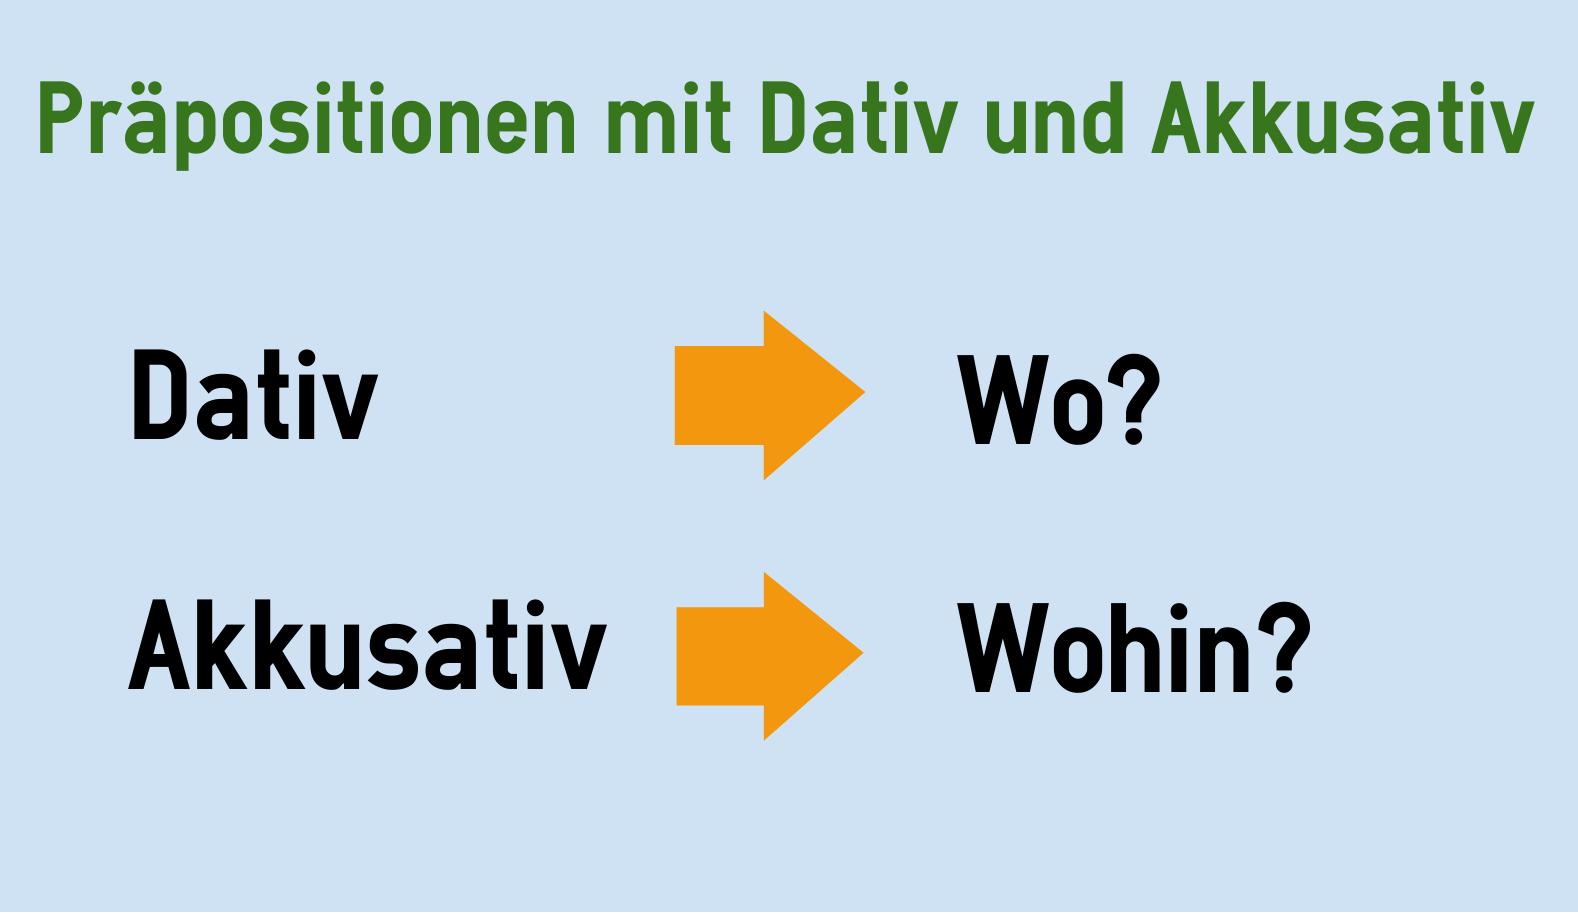 Popular dativ oder akkusativ in69 startupjobsfa for Prapositionen mit akkusativ